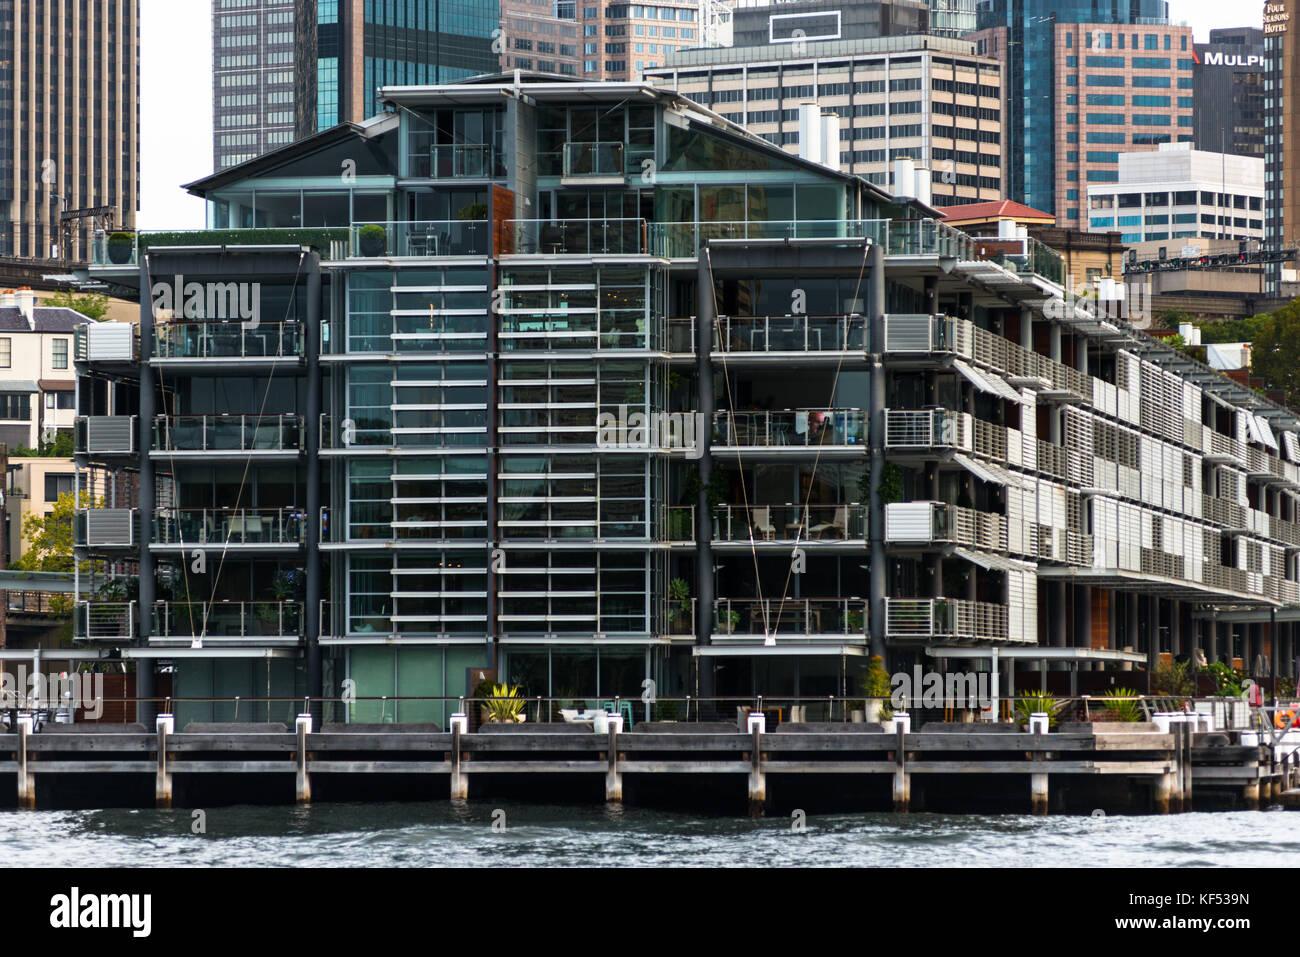 Apartments, Pier 1, Walsh Bay, Sydney, New South Wales, Australia - Stock Image